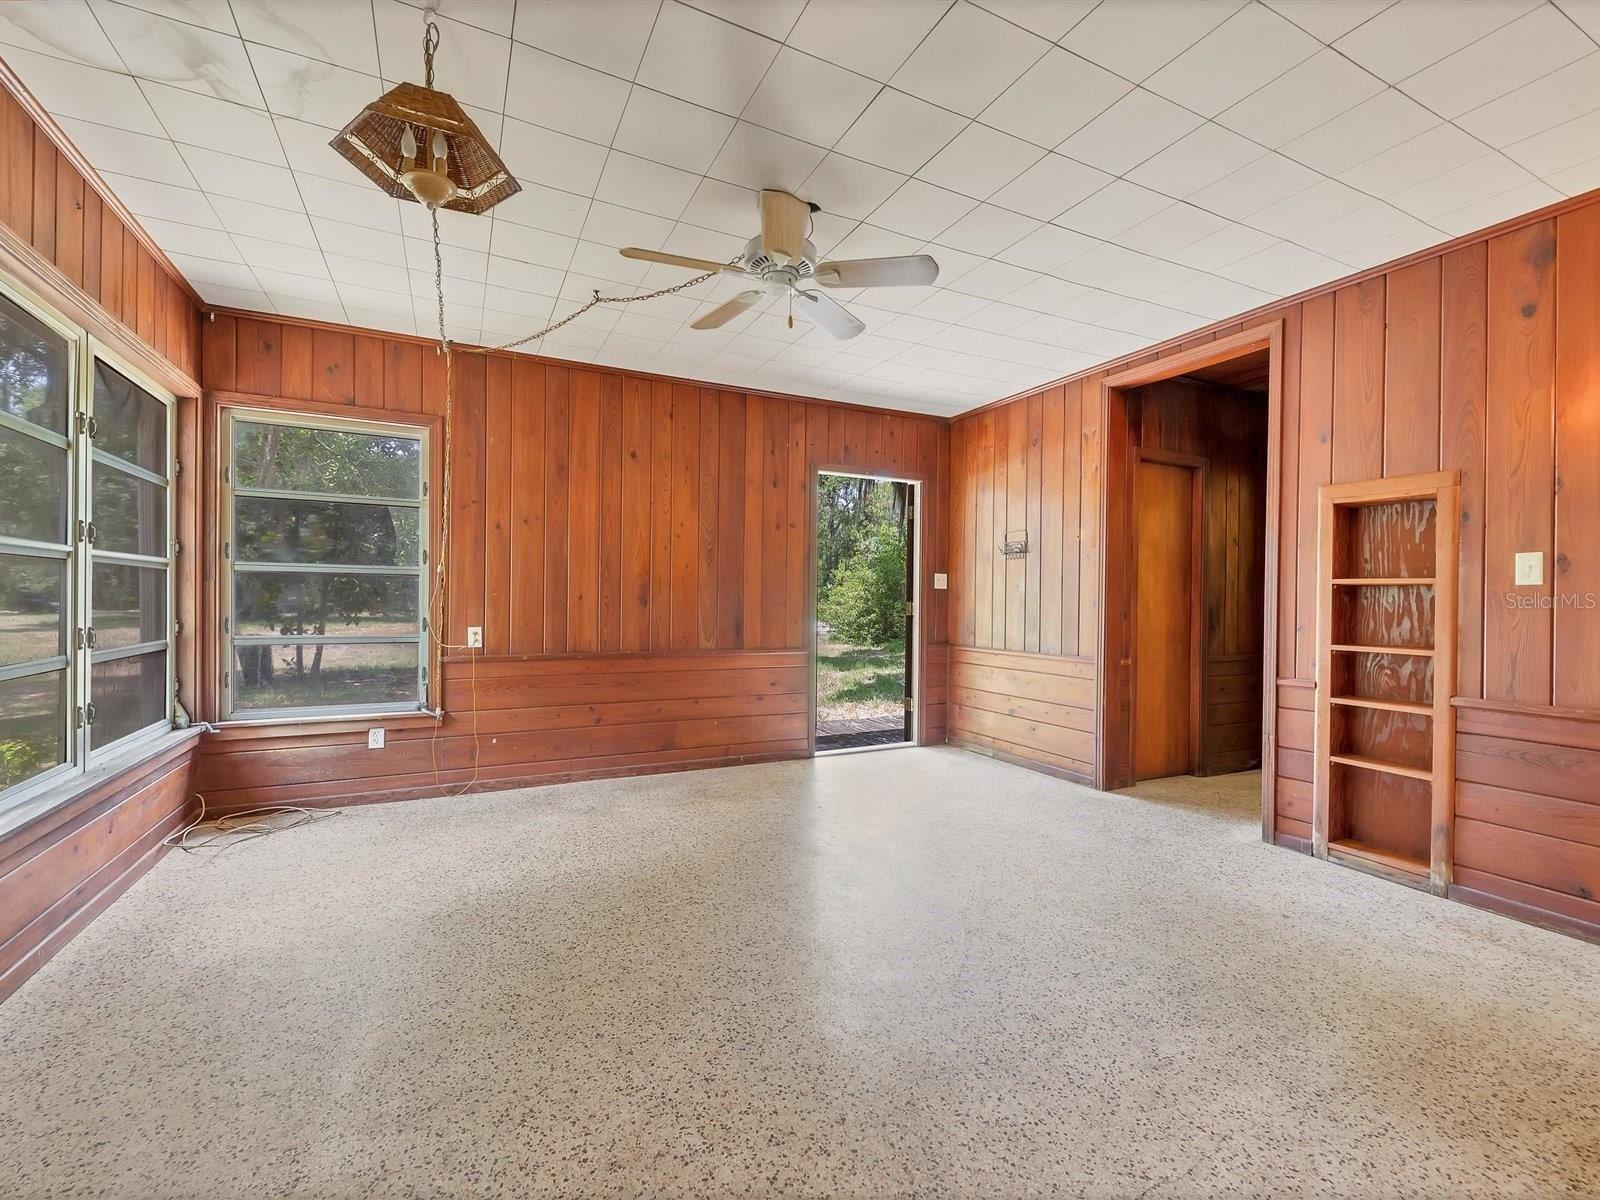 Photo of 1949 BRIDGE ST, ENGLEWOOD, FL 34223 (MLS # A4501929)